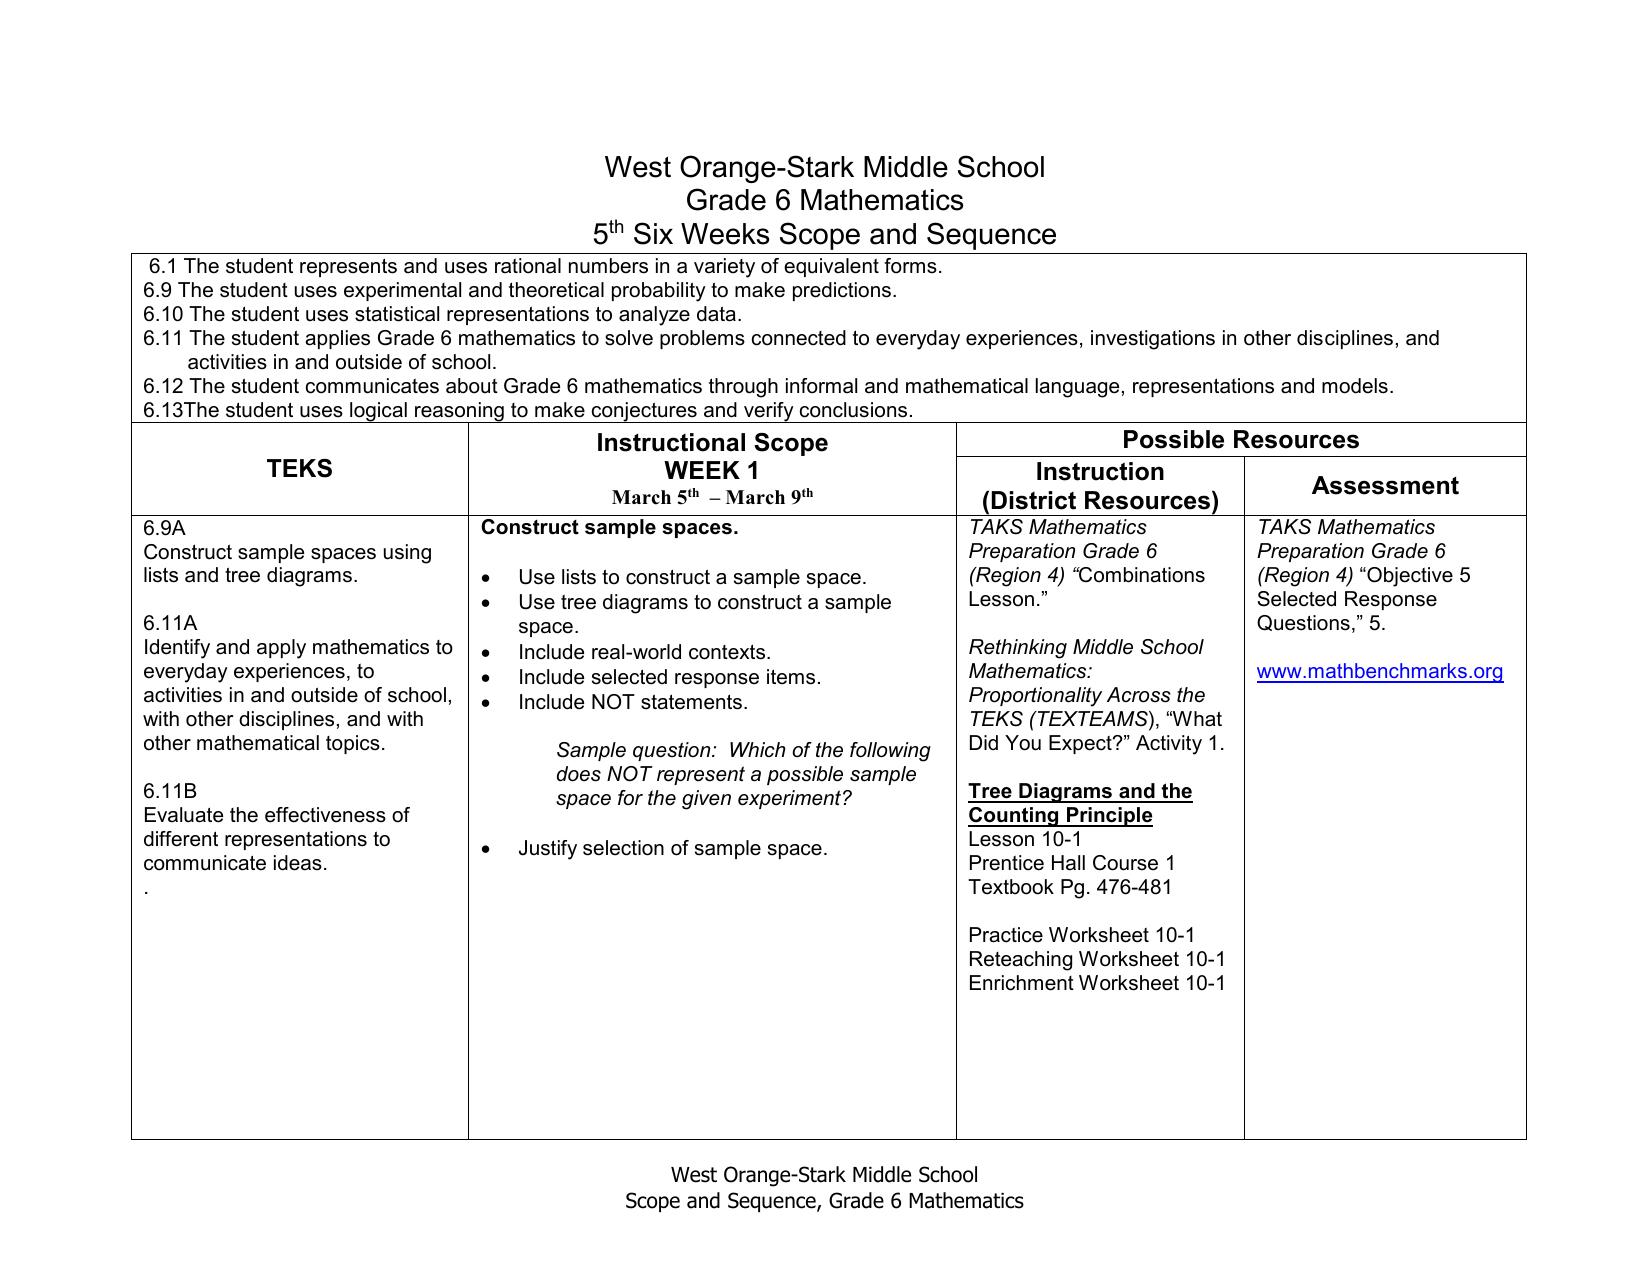 West Orange-Stark Middle School Grade 6 Mathematics 5th Six